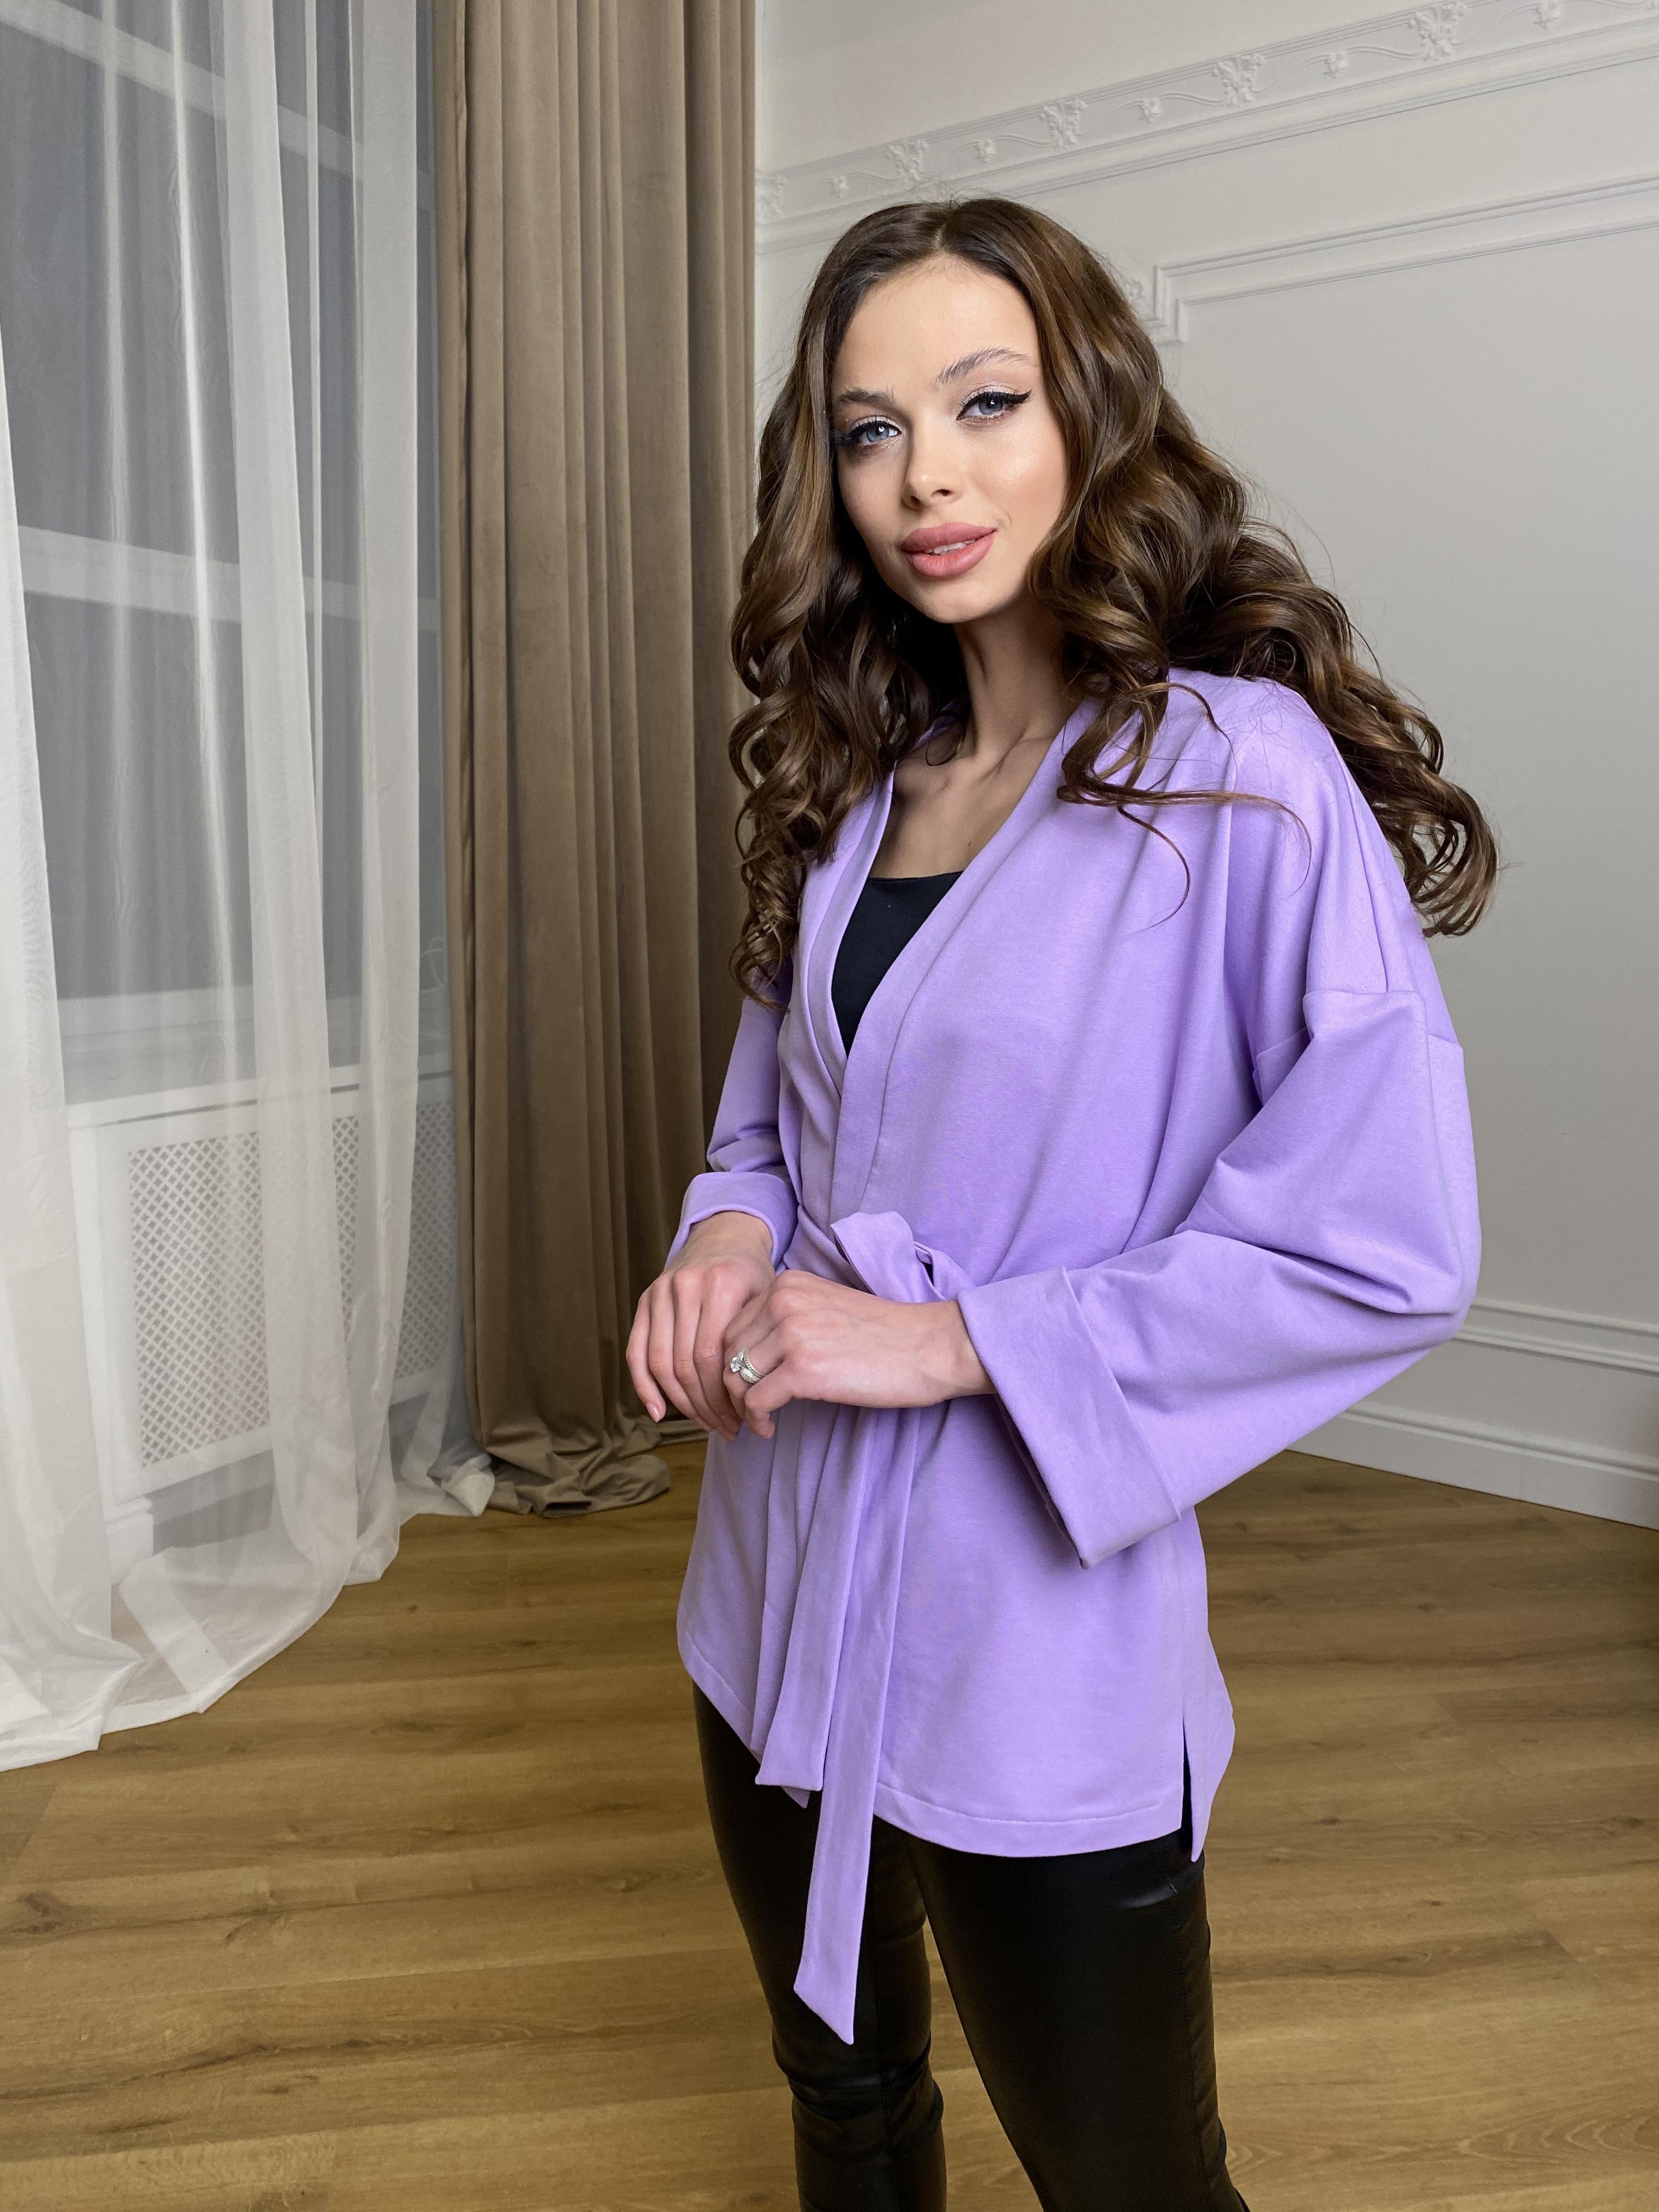 Жакет Лаванда 9665 АРТ. 45975 Цвет: лаванда - фото 4, интернет магазин tm-modus.ru